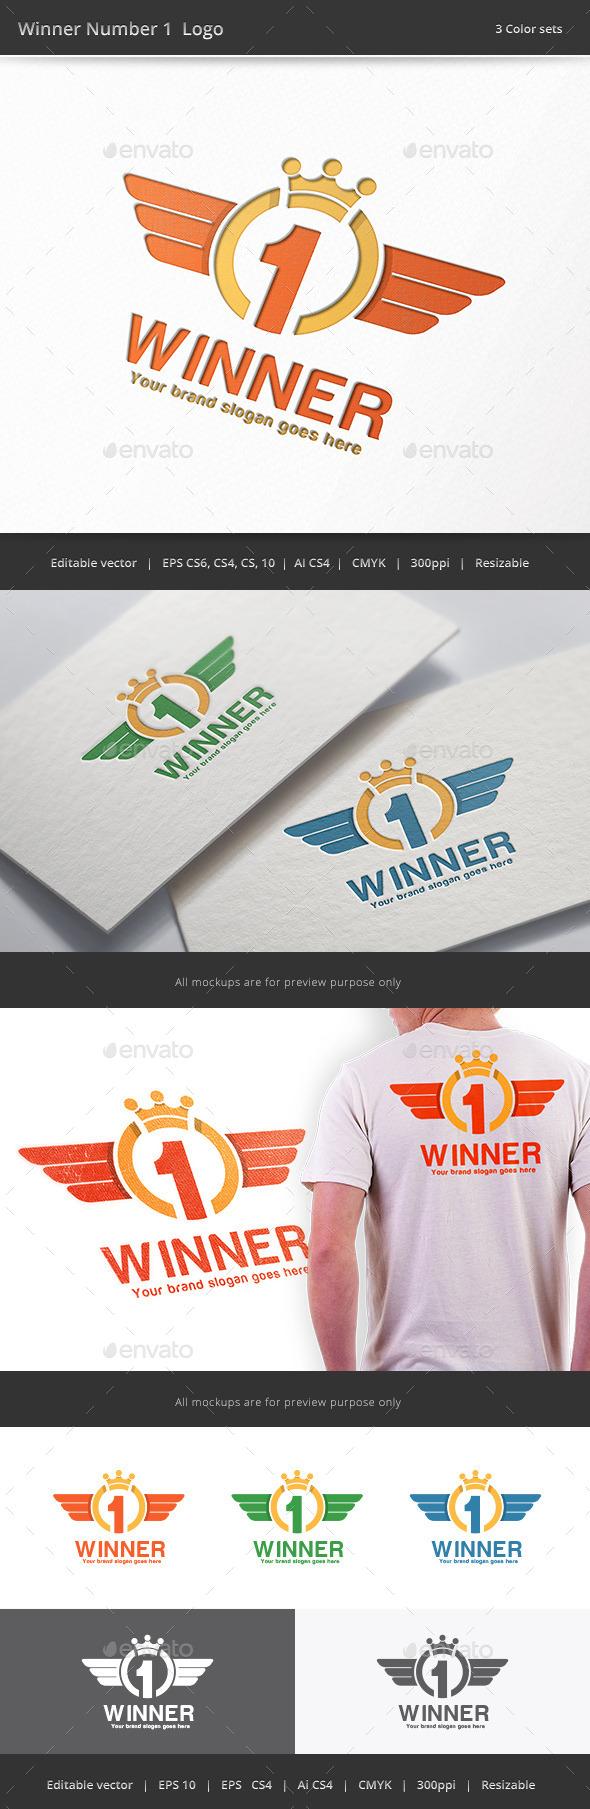 GraphicRiver Winner Number 1 Logo 9281945